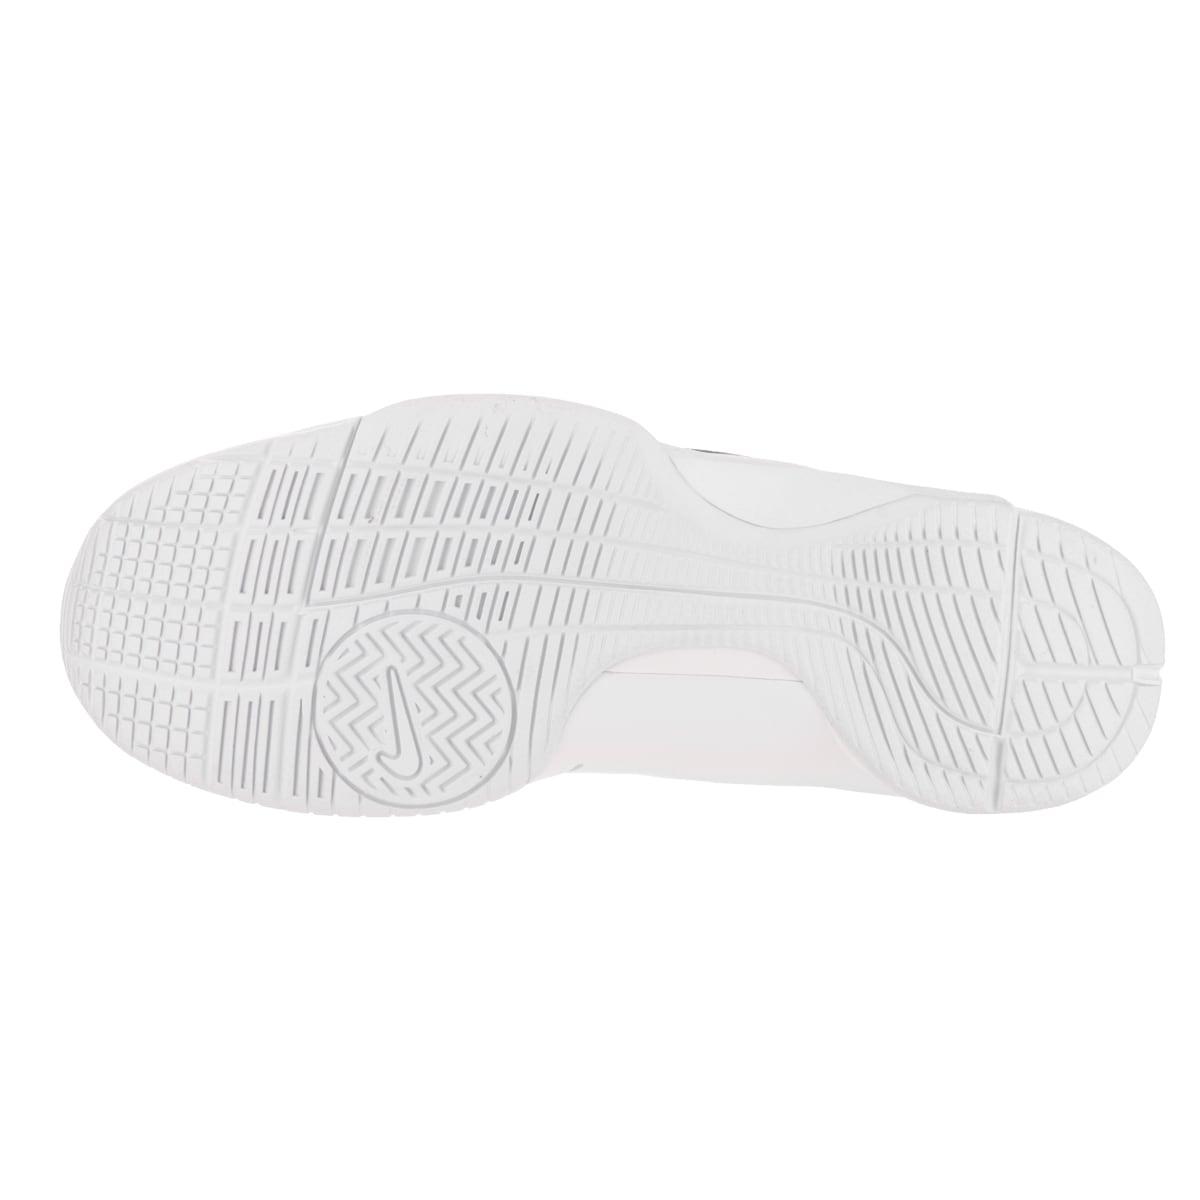 b60647d205e8 Shop Nike Men s Hyperdunk Low Lux Basketball Shoe - Free Shipping Today -  Overstock.com - 14427951